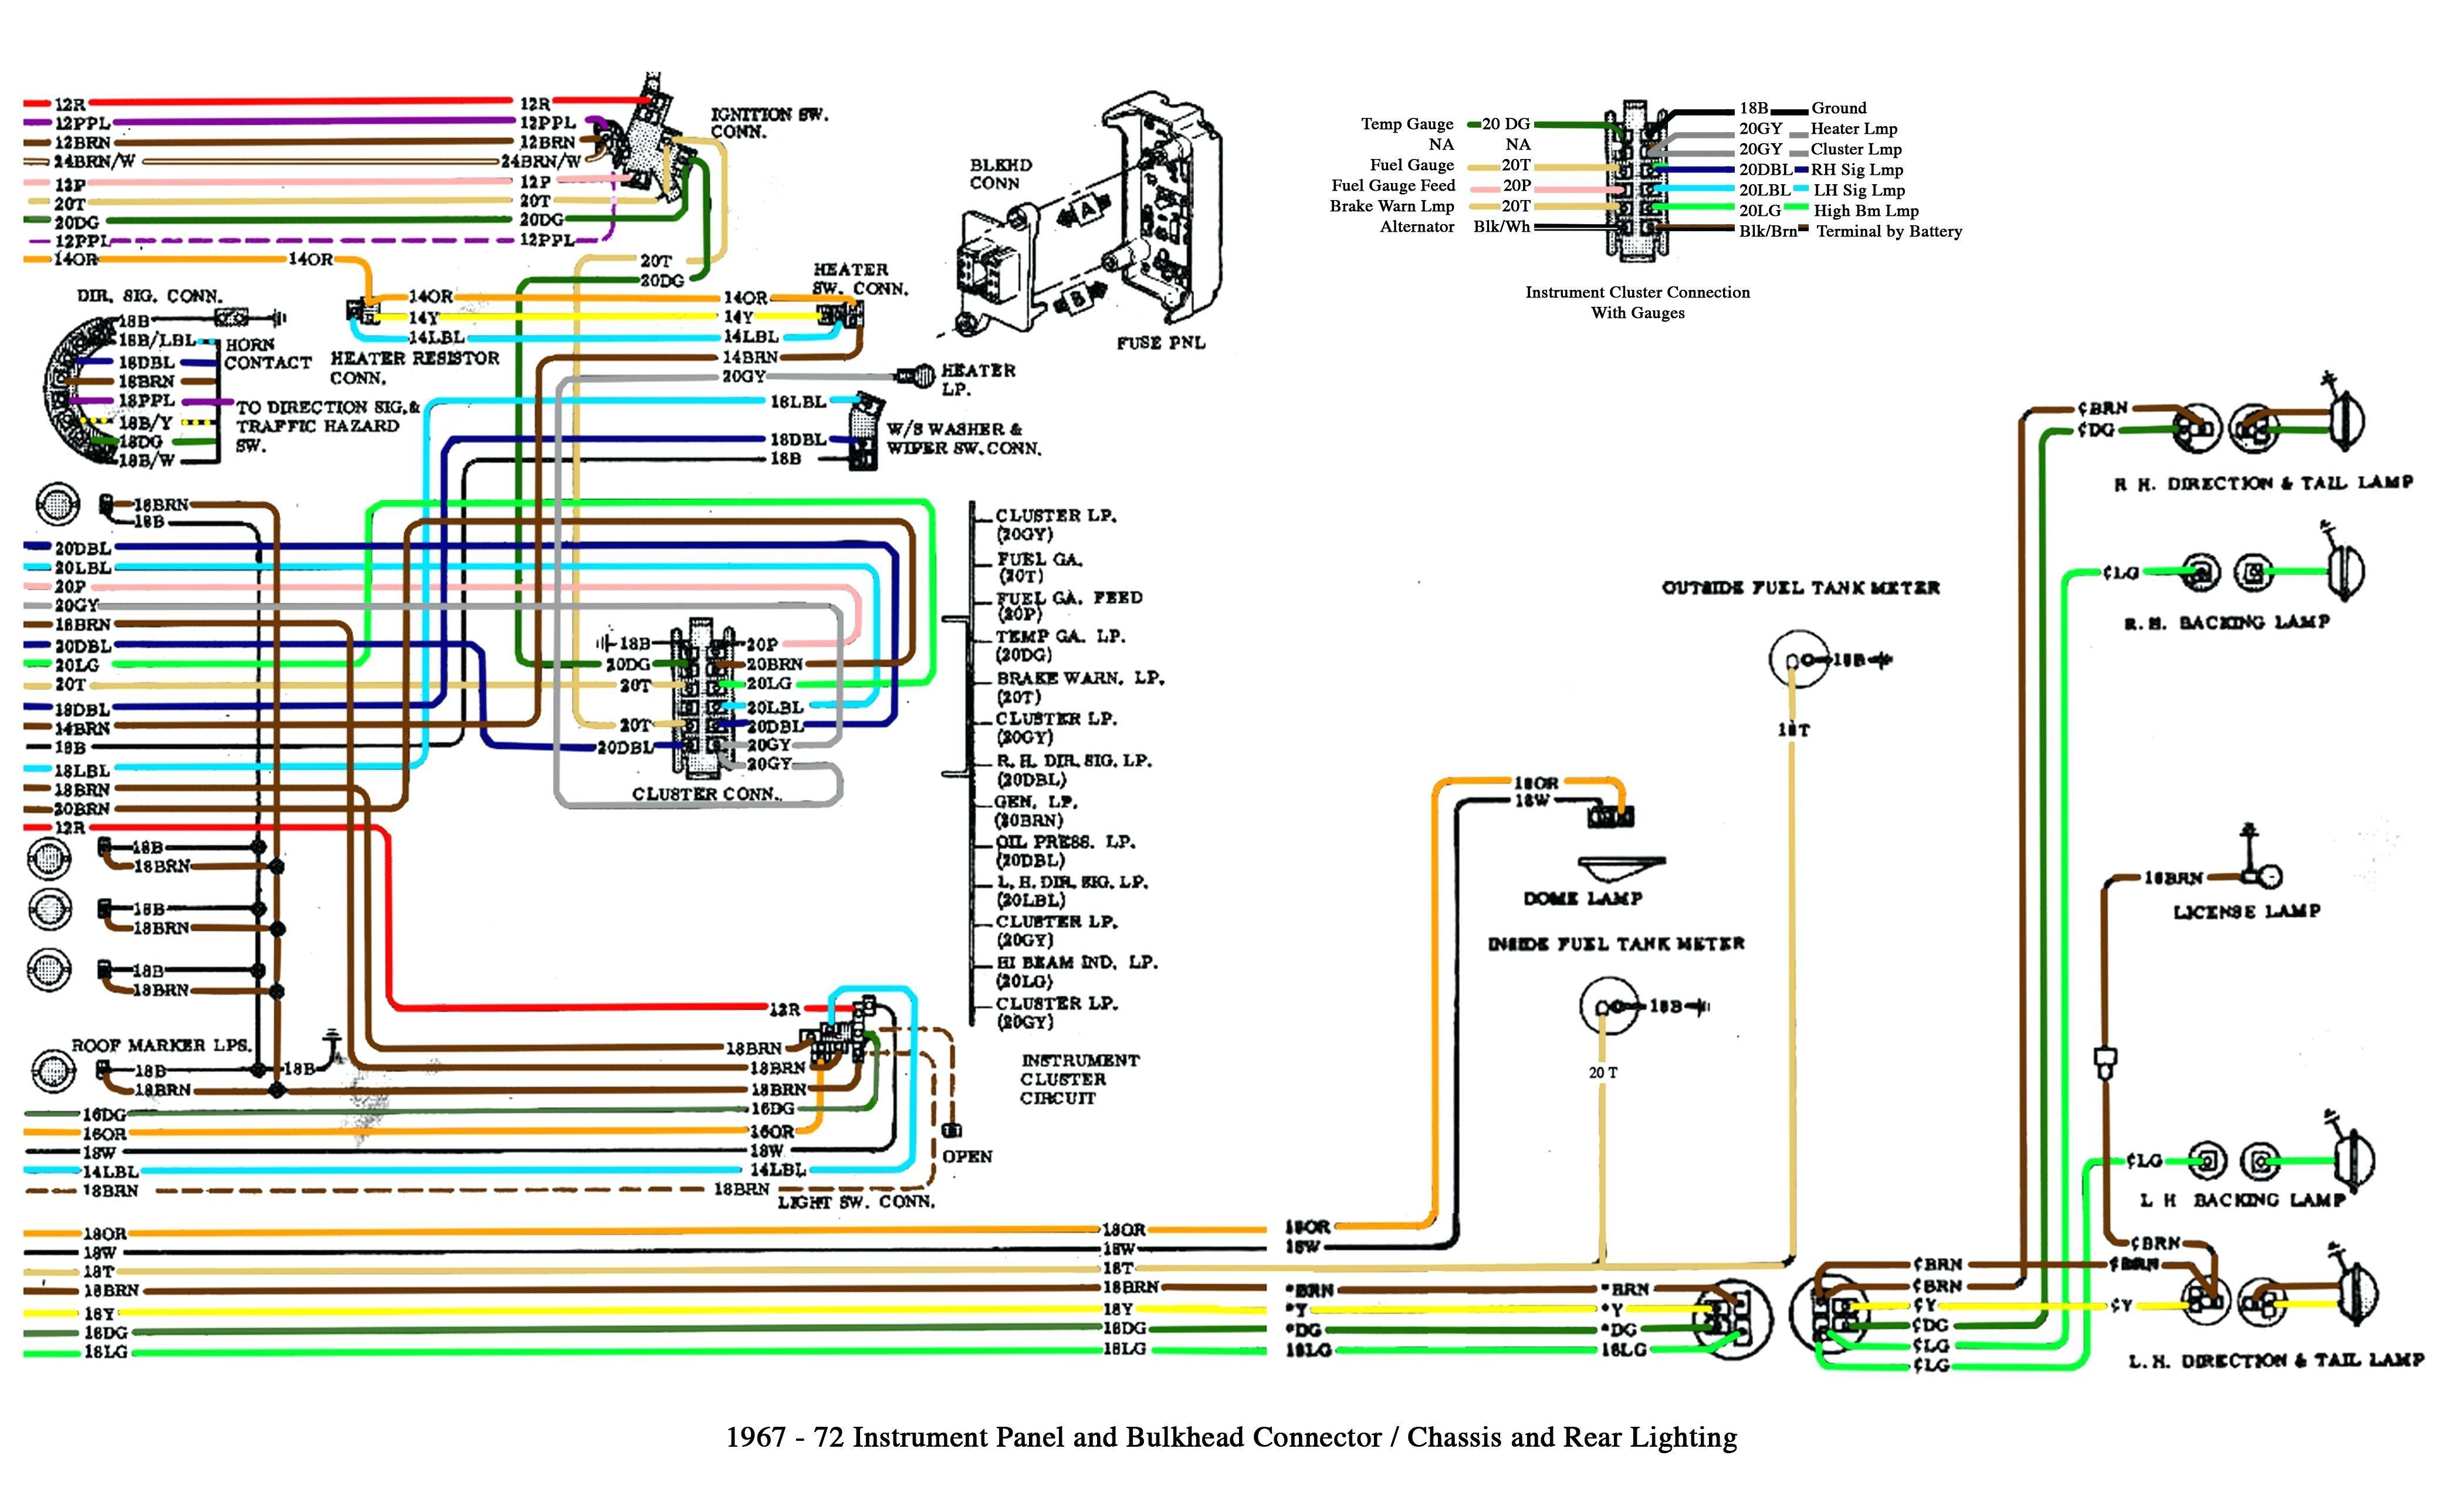 10 Tahoe Radio Amp Wiring Diagram | Manual E-Books - 2002 Chevy Tahoe Radio Wiring Diagram